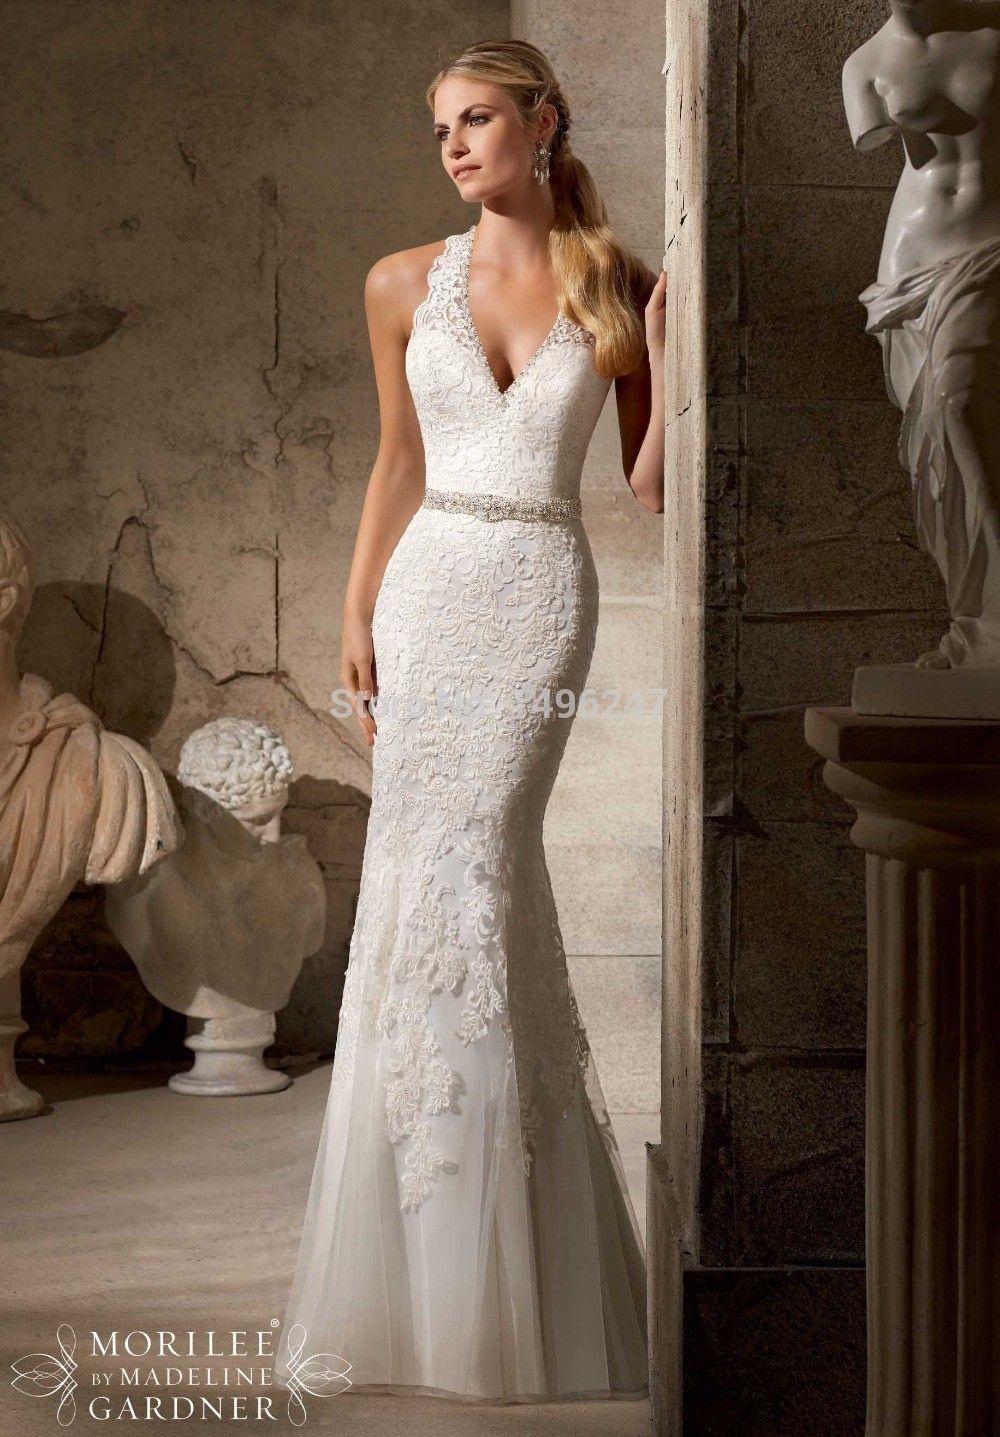 55+ Tight Wedding Dresses - Best Shapewear for Wedding Dress Check ...